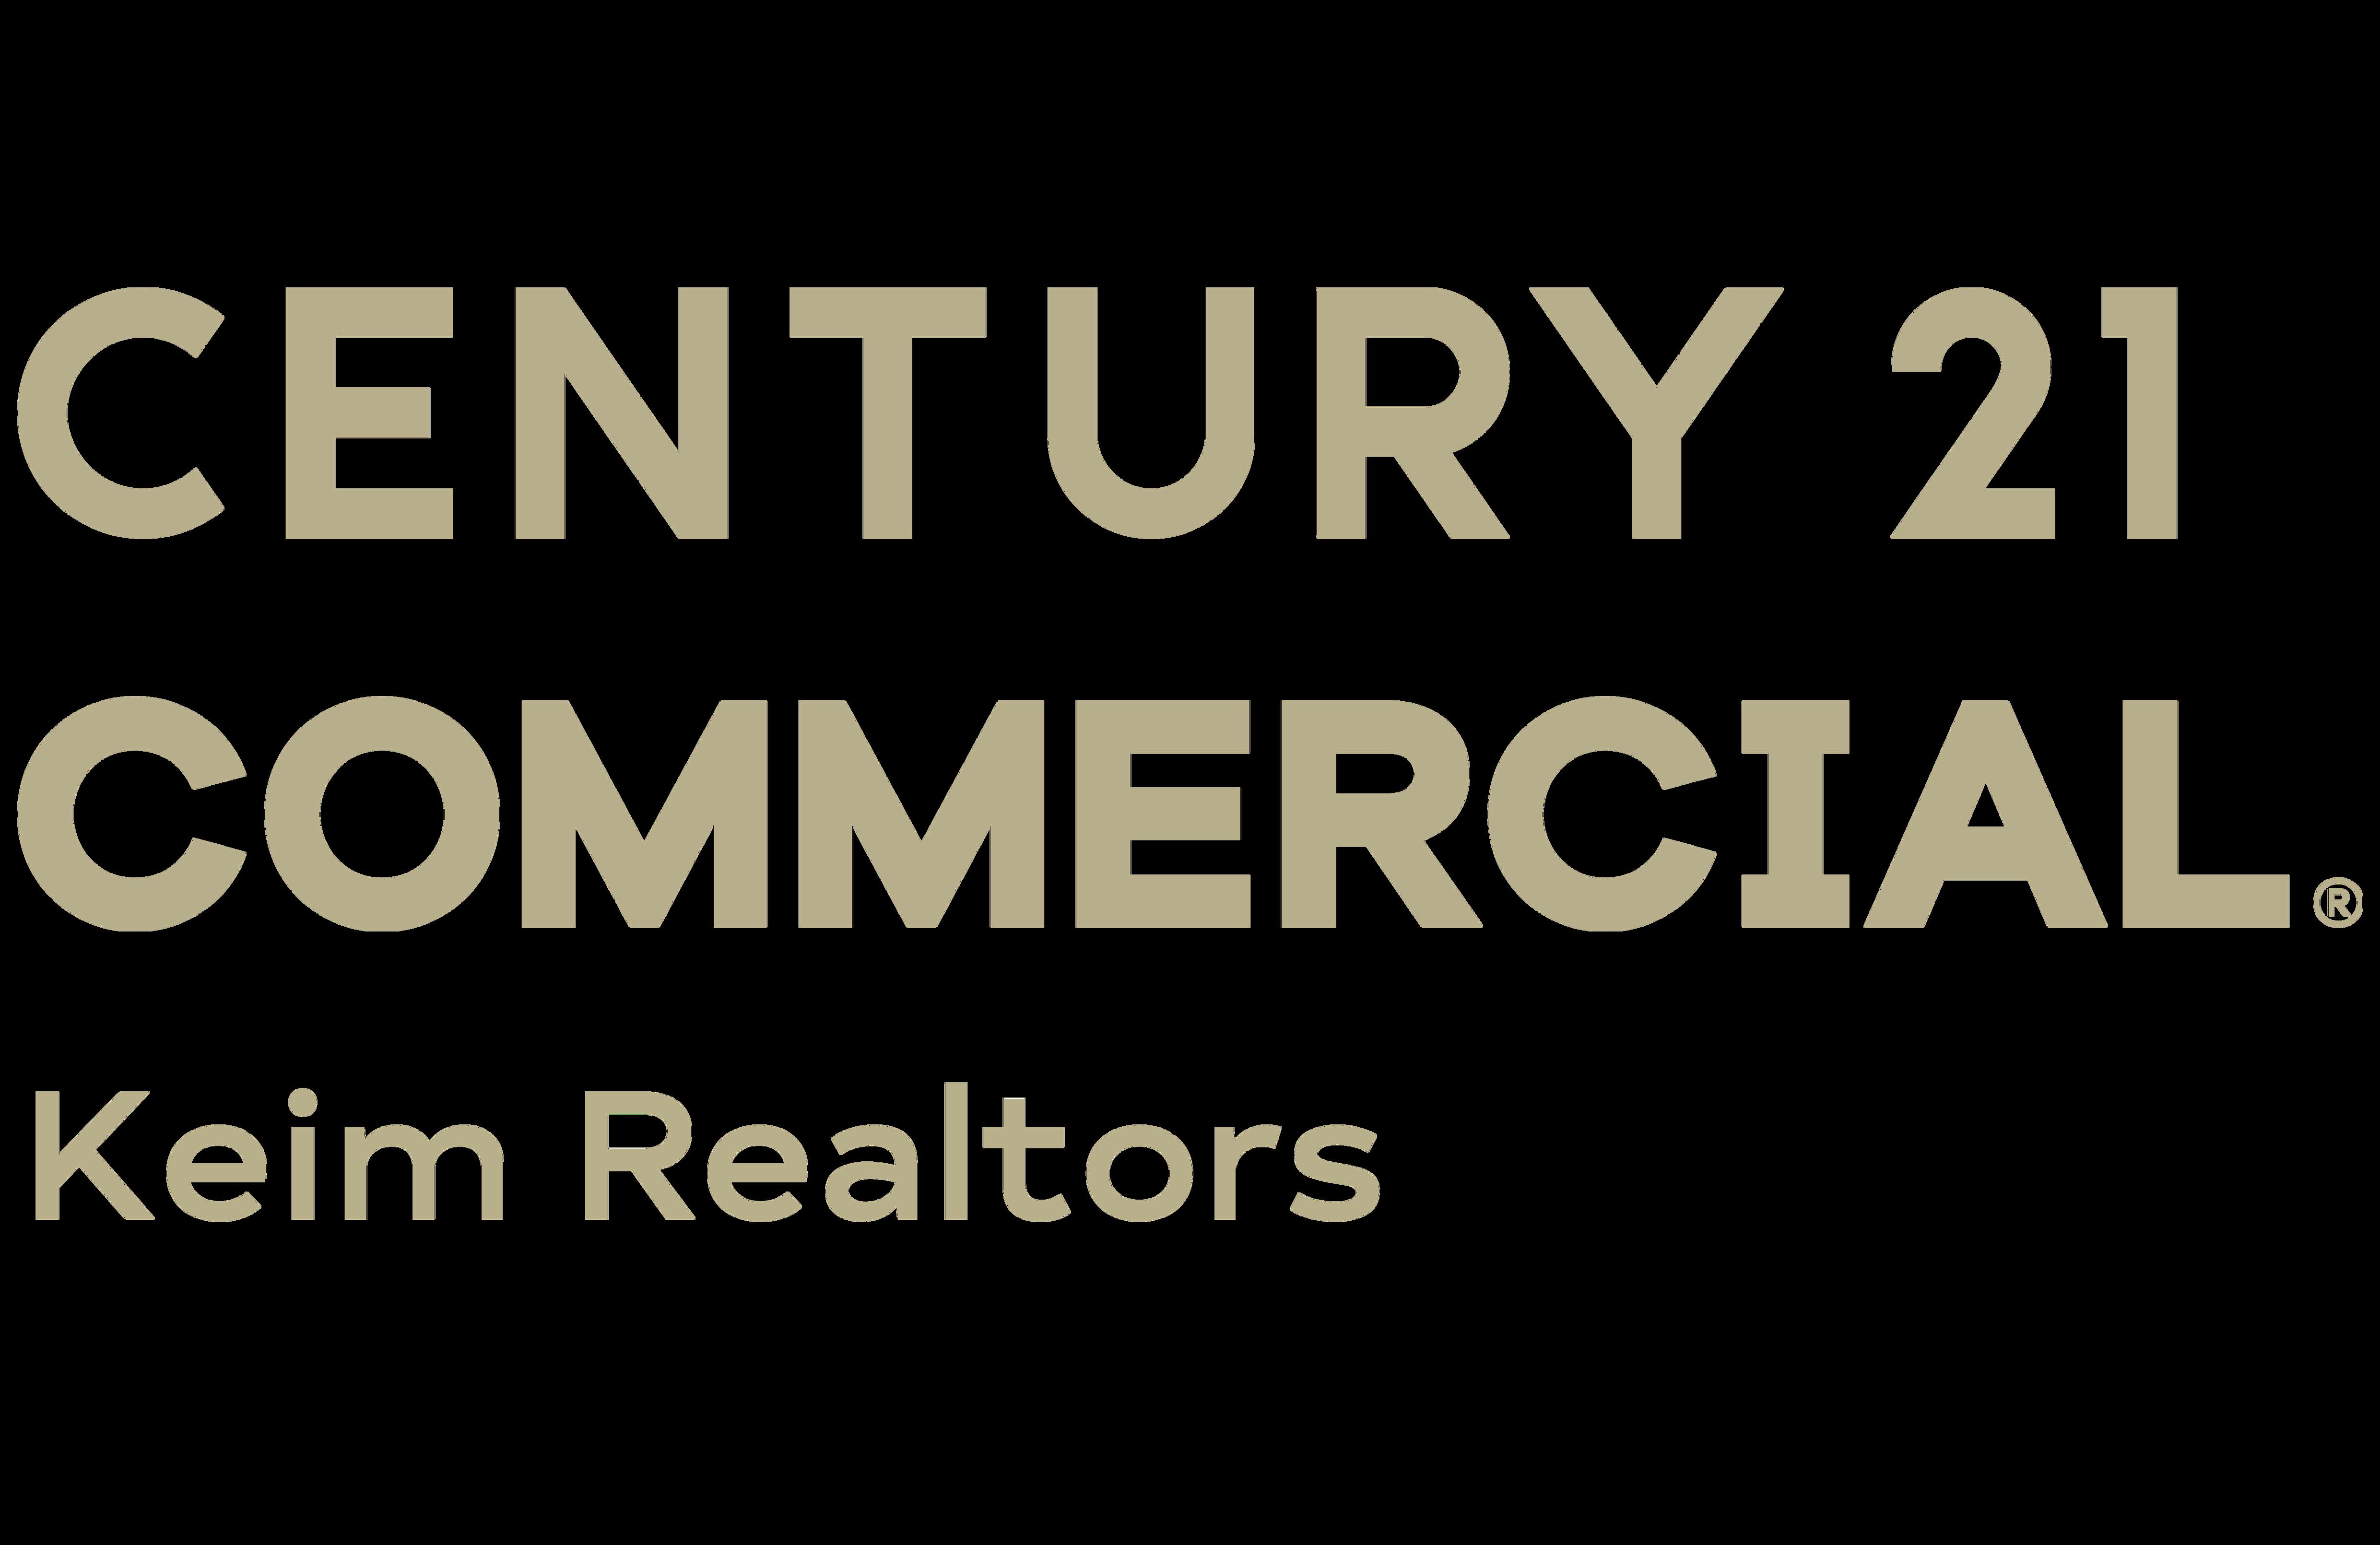 Tarrant Booker of CENTURY 21 Keim Realtors logo